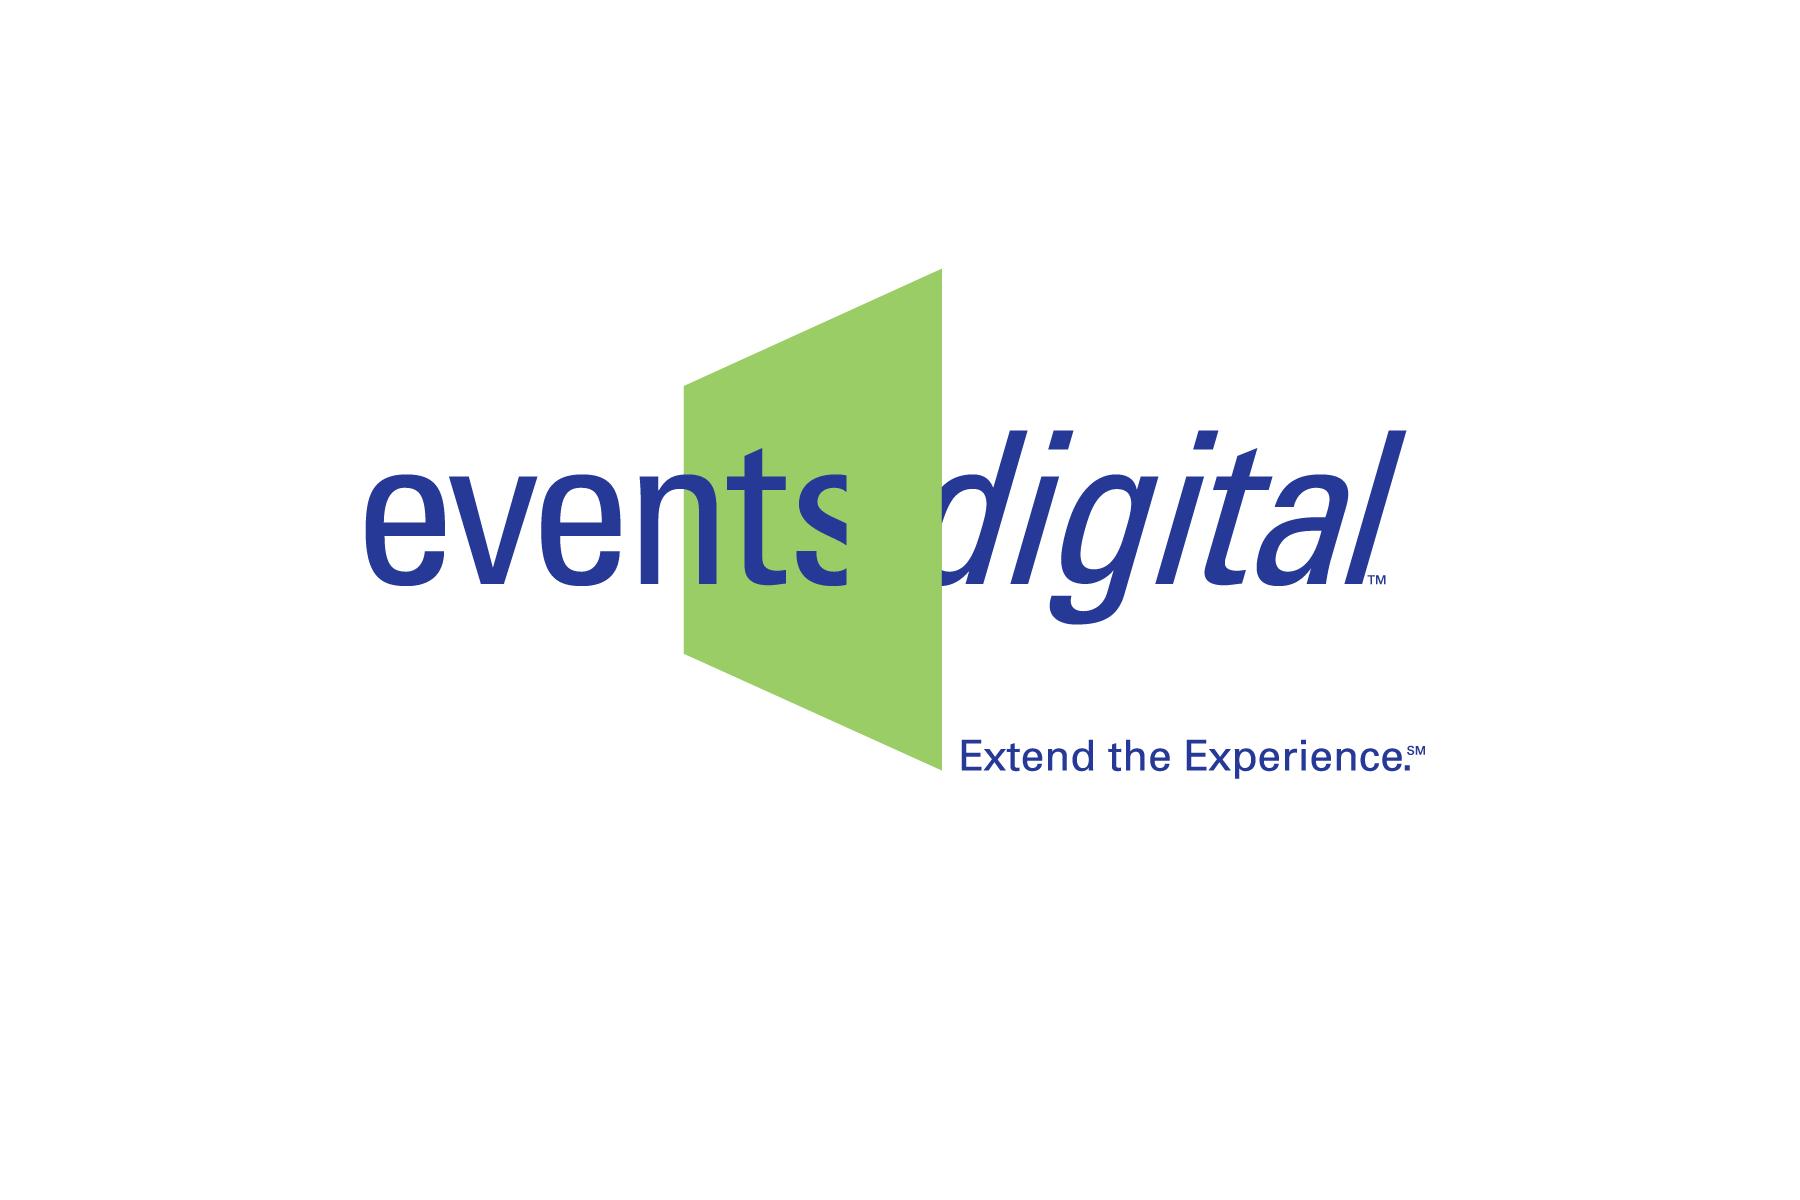 events-digital-1800x1200